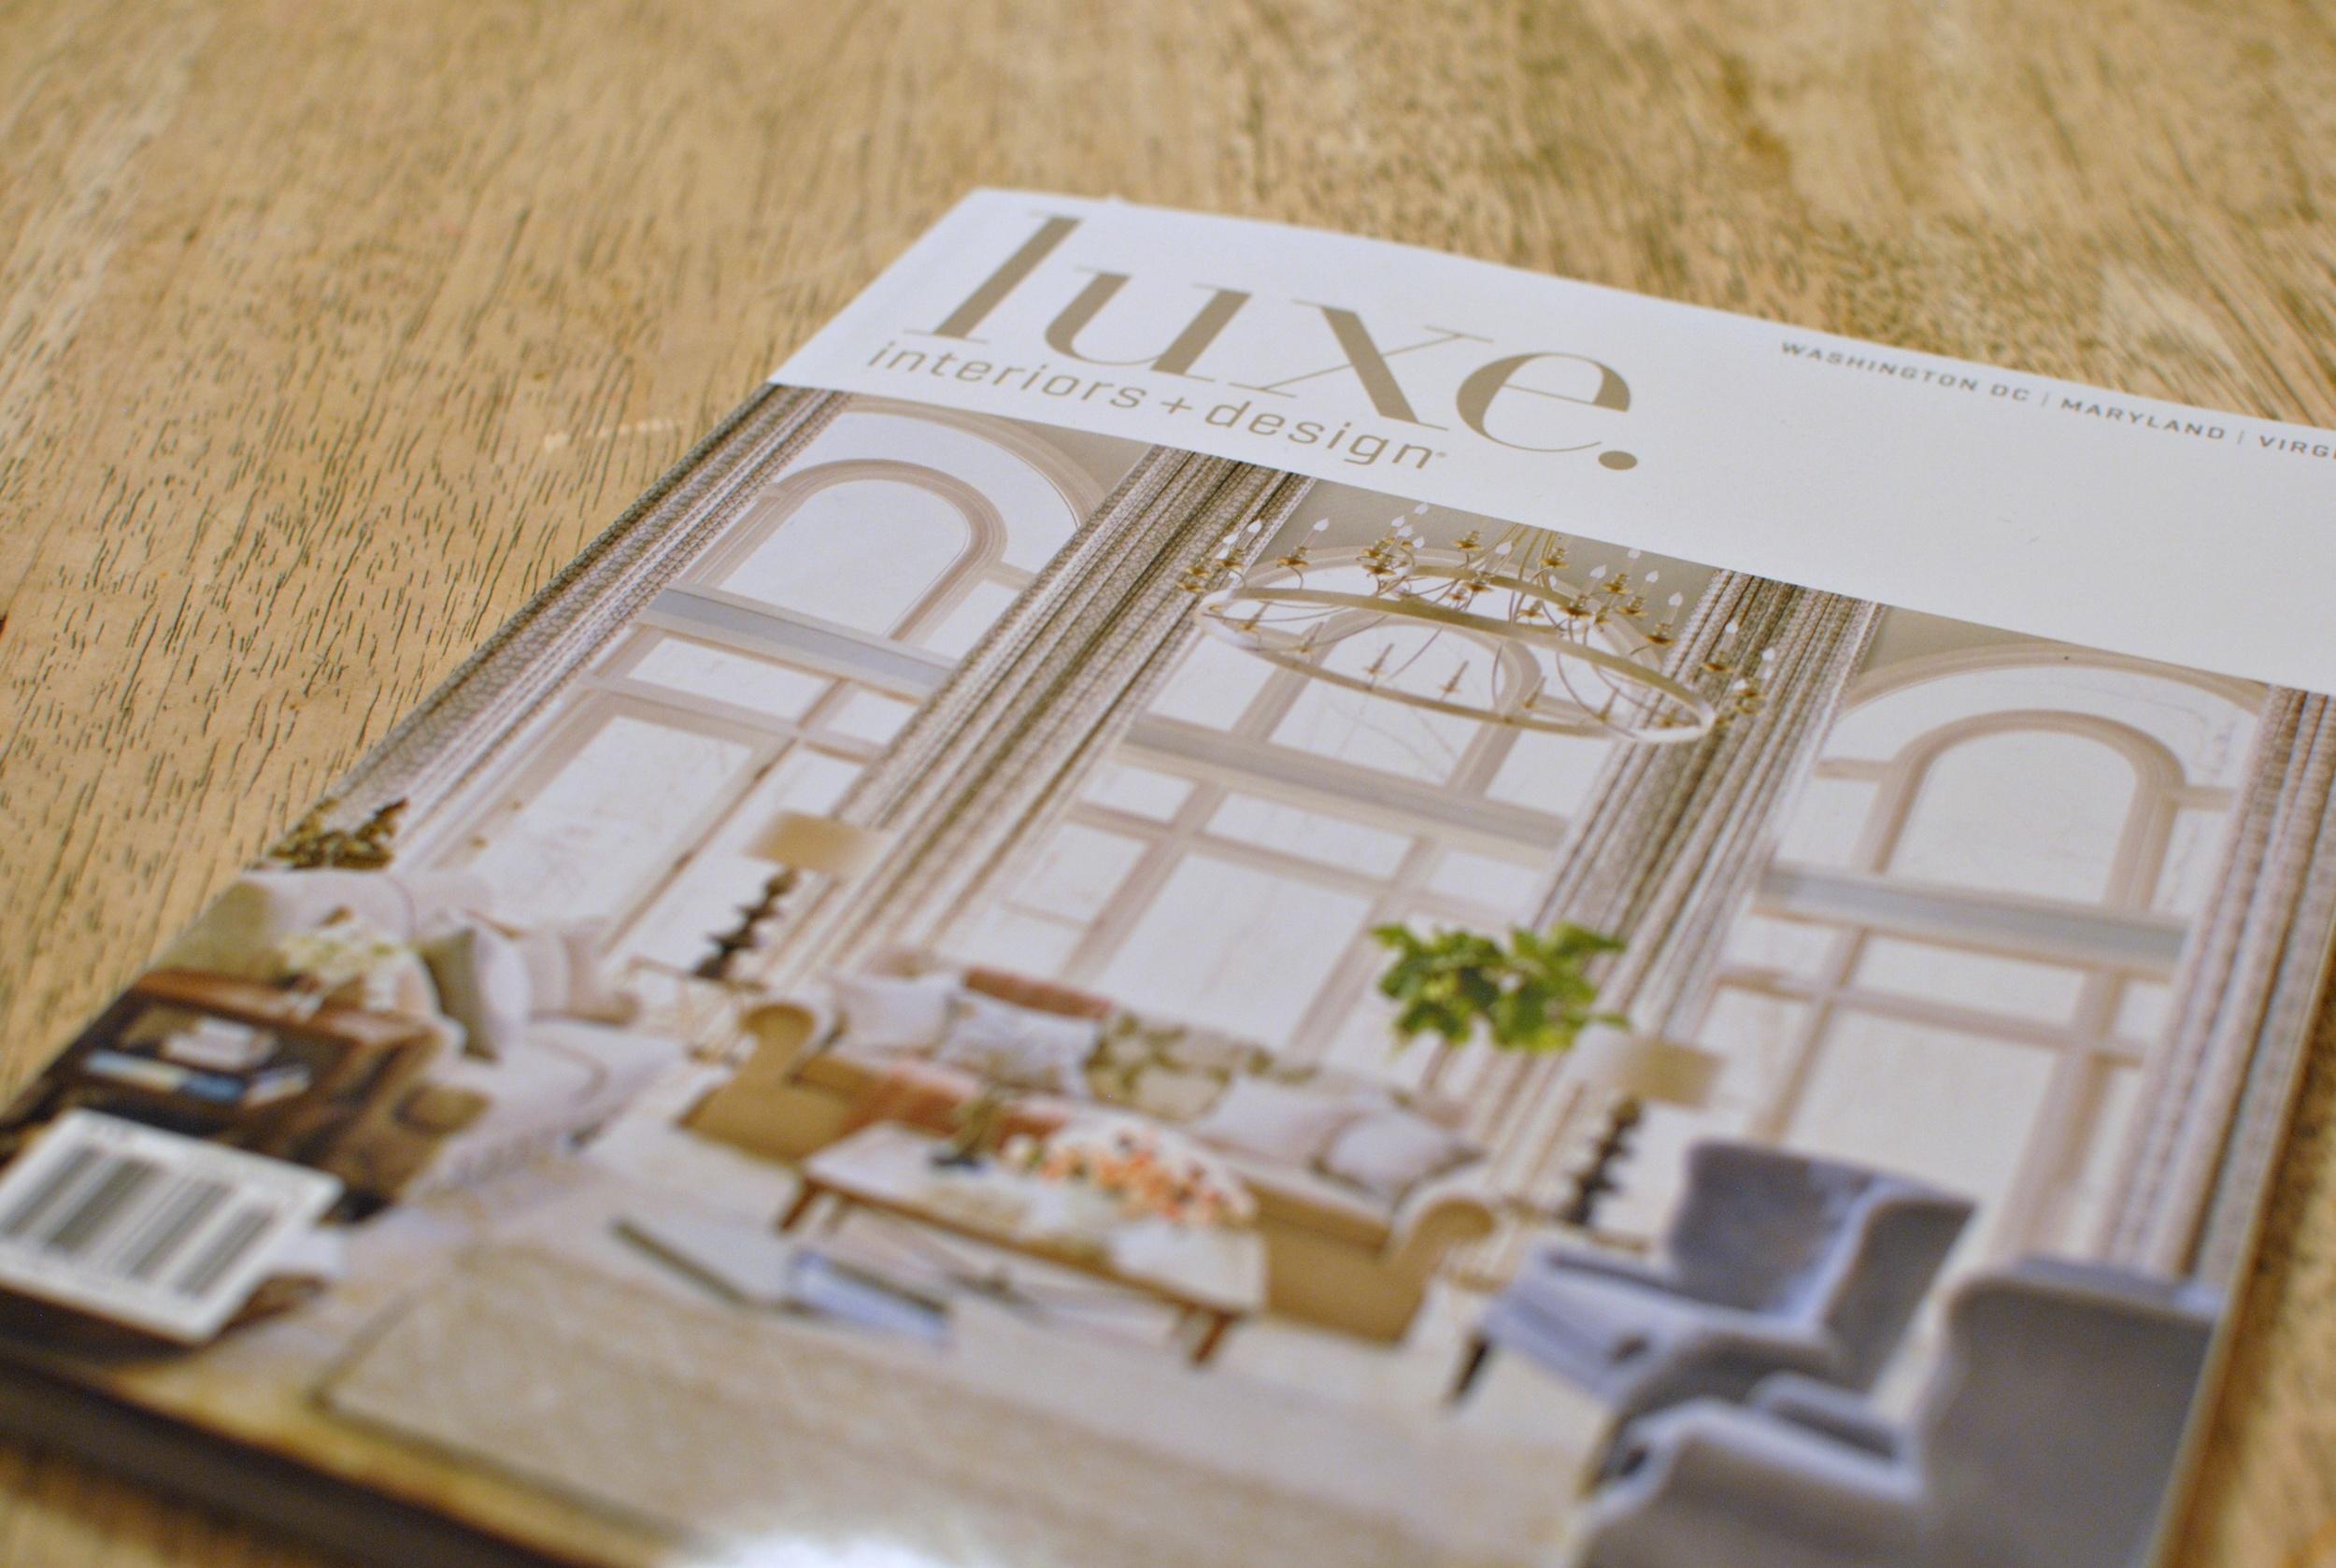 luxe-magazine-cover